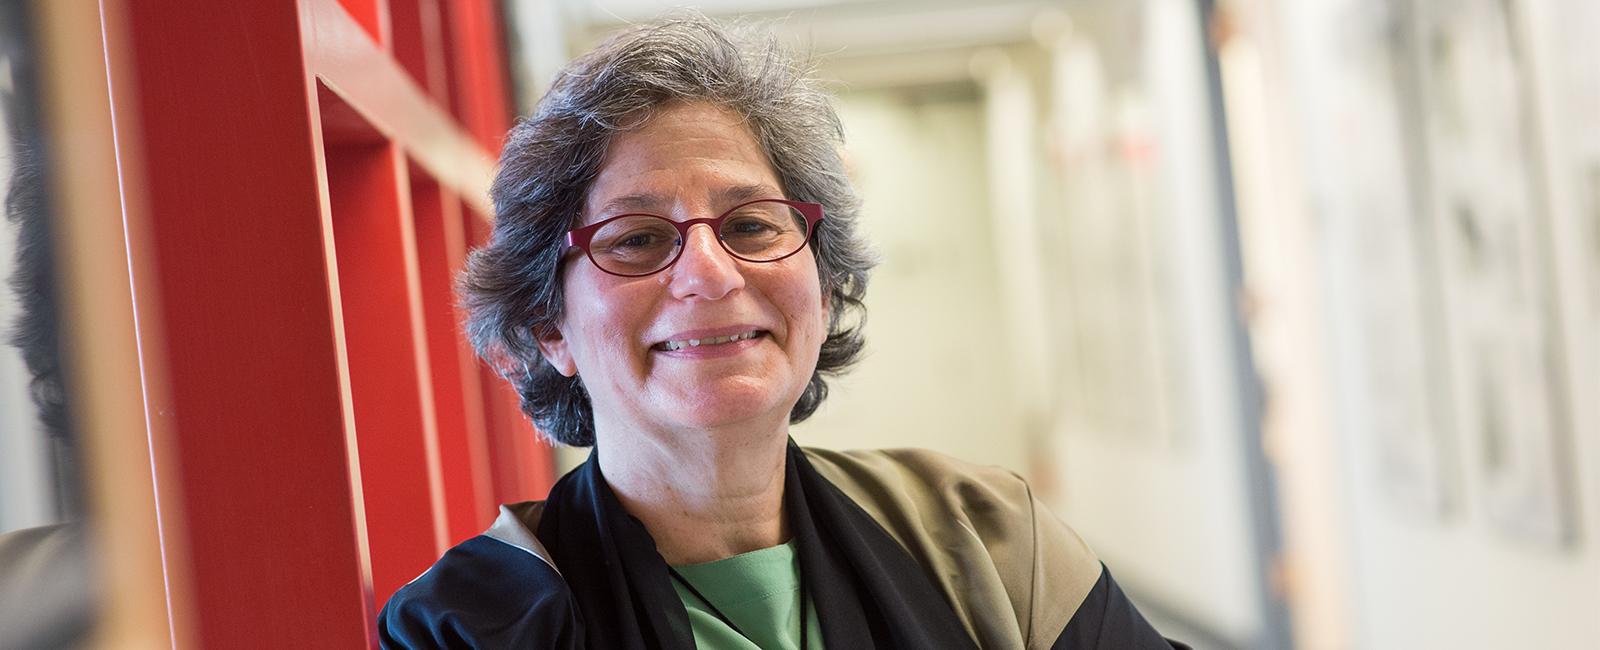 Image of Professor Susan Solomon